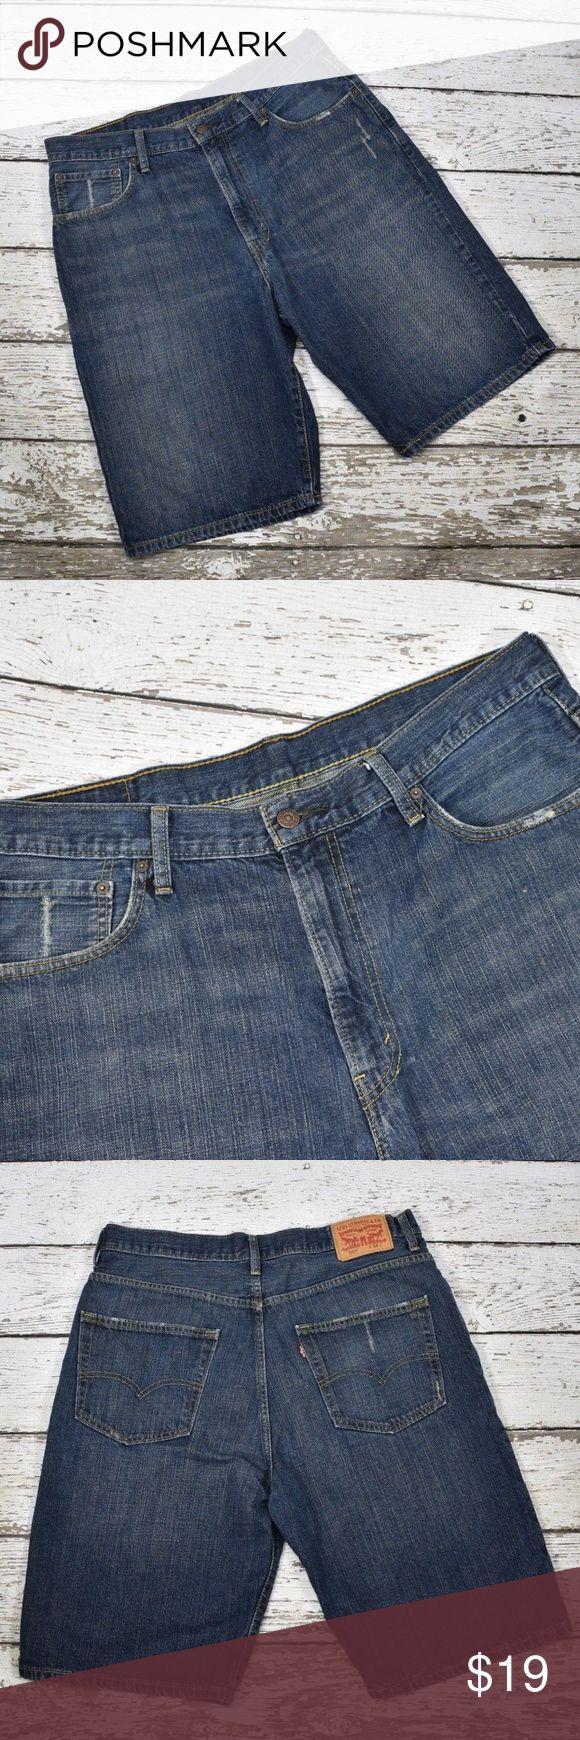 "Levi 569 Men's Jean Dark Denim Shorts Men's Levi 569 denim shorts Size 36 normal wash/wear  measurements laying flat: waist 19"" total length 26"" Levi's Shorts Jean Shorts"